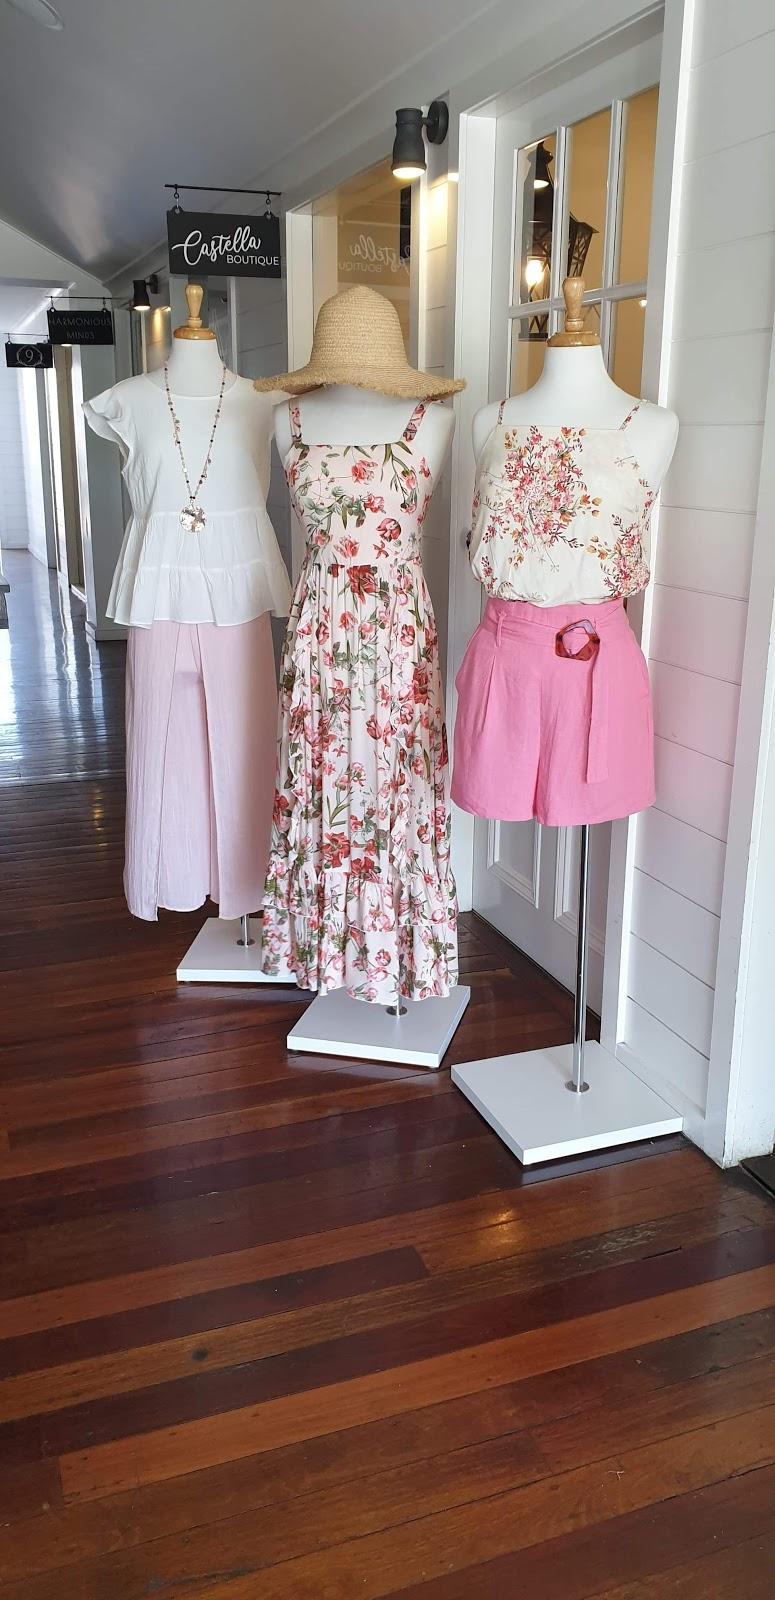 Castella Boutique   clothing store   7/130 Ryans Rd, Nundah QLD 4012, Australia   0415722740 OR +61 415 722 740